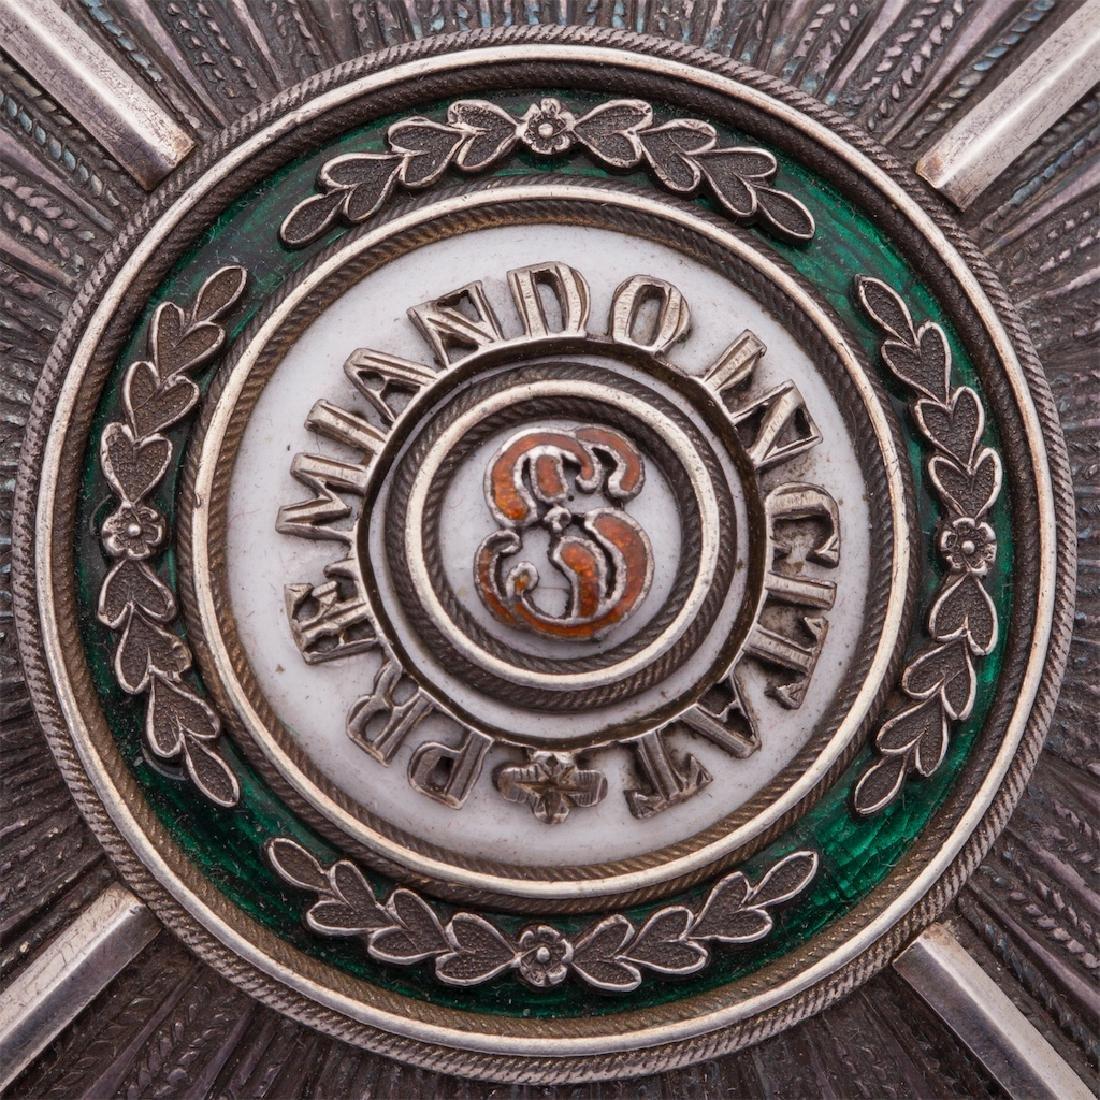 Breast star, Order of Saint Stanislaus I class - 6